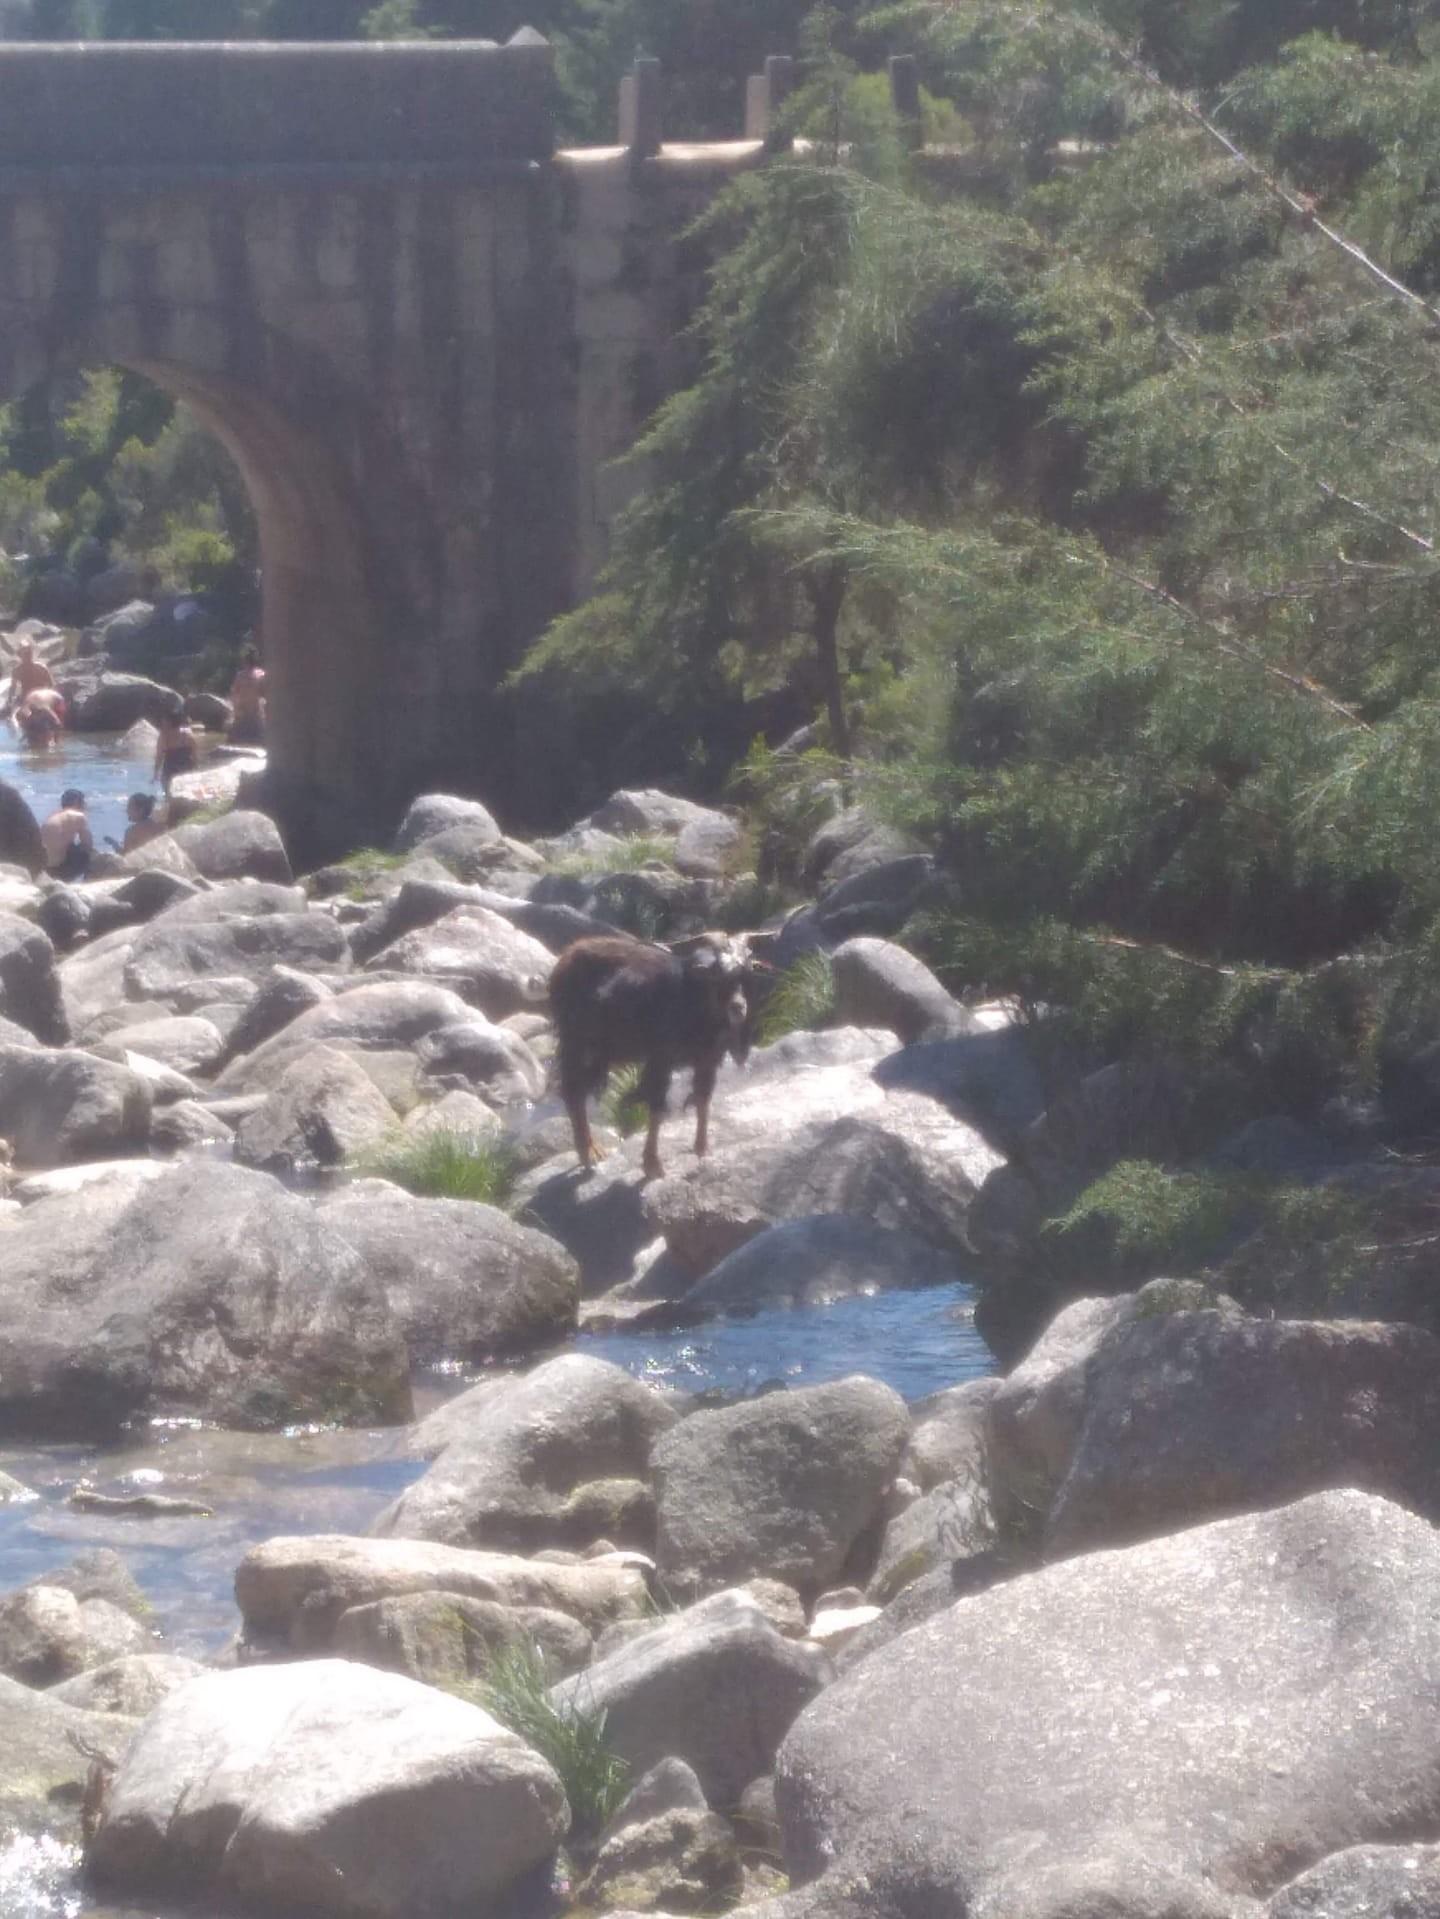 visite-parc-santo-inacio-chute-deau-merv